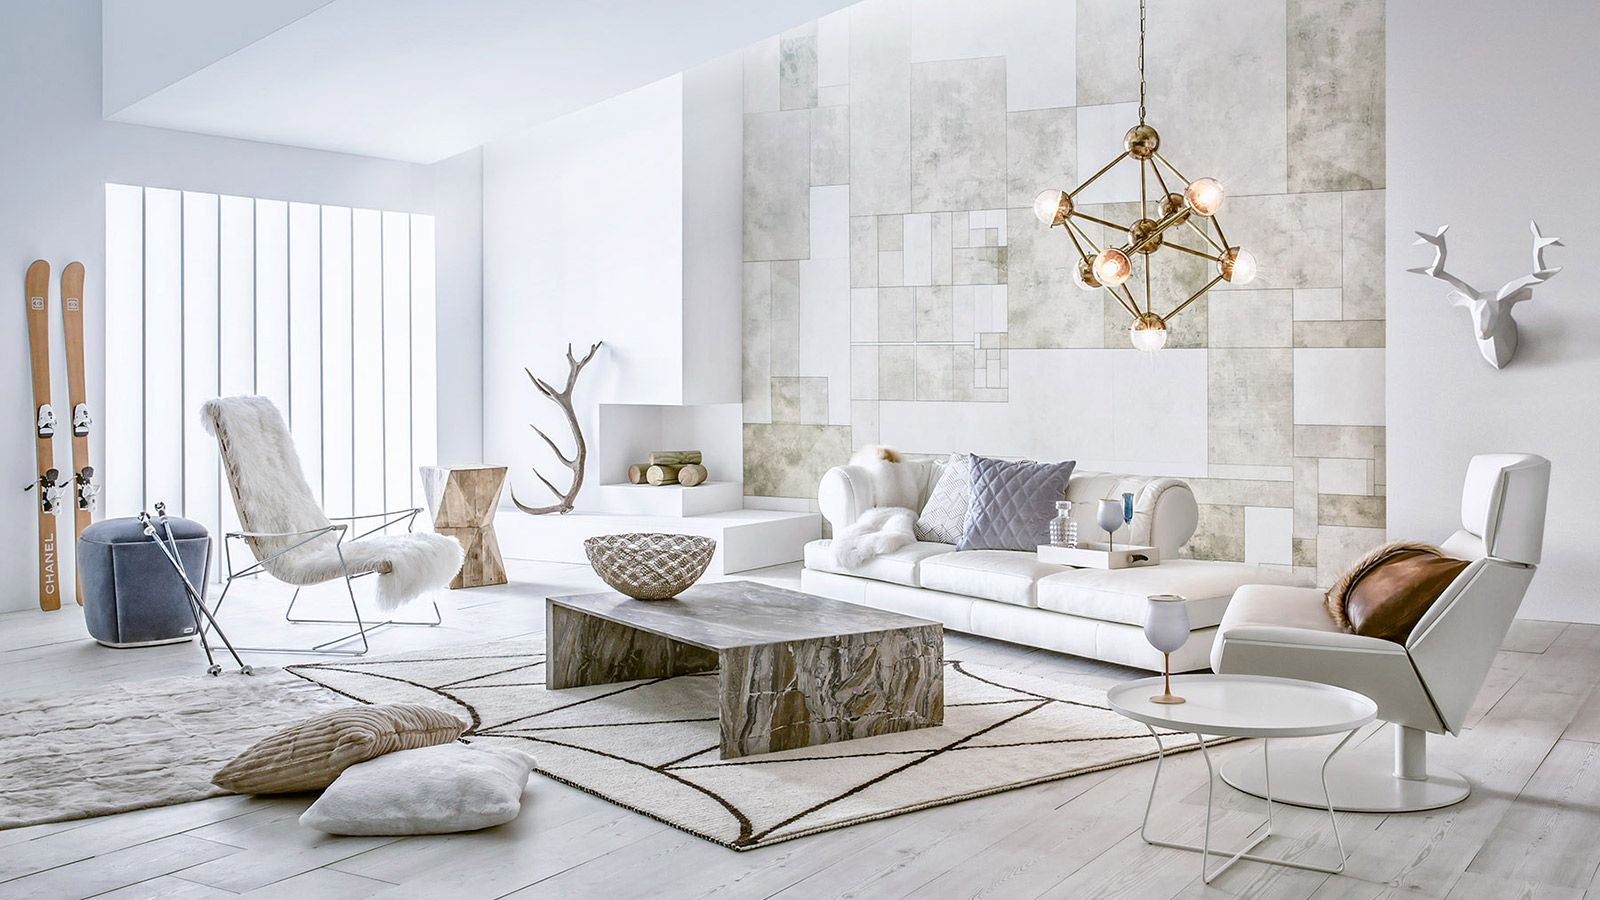 The Winter S Tale Living Room Design Modern Interior Design